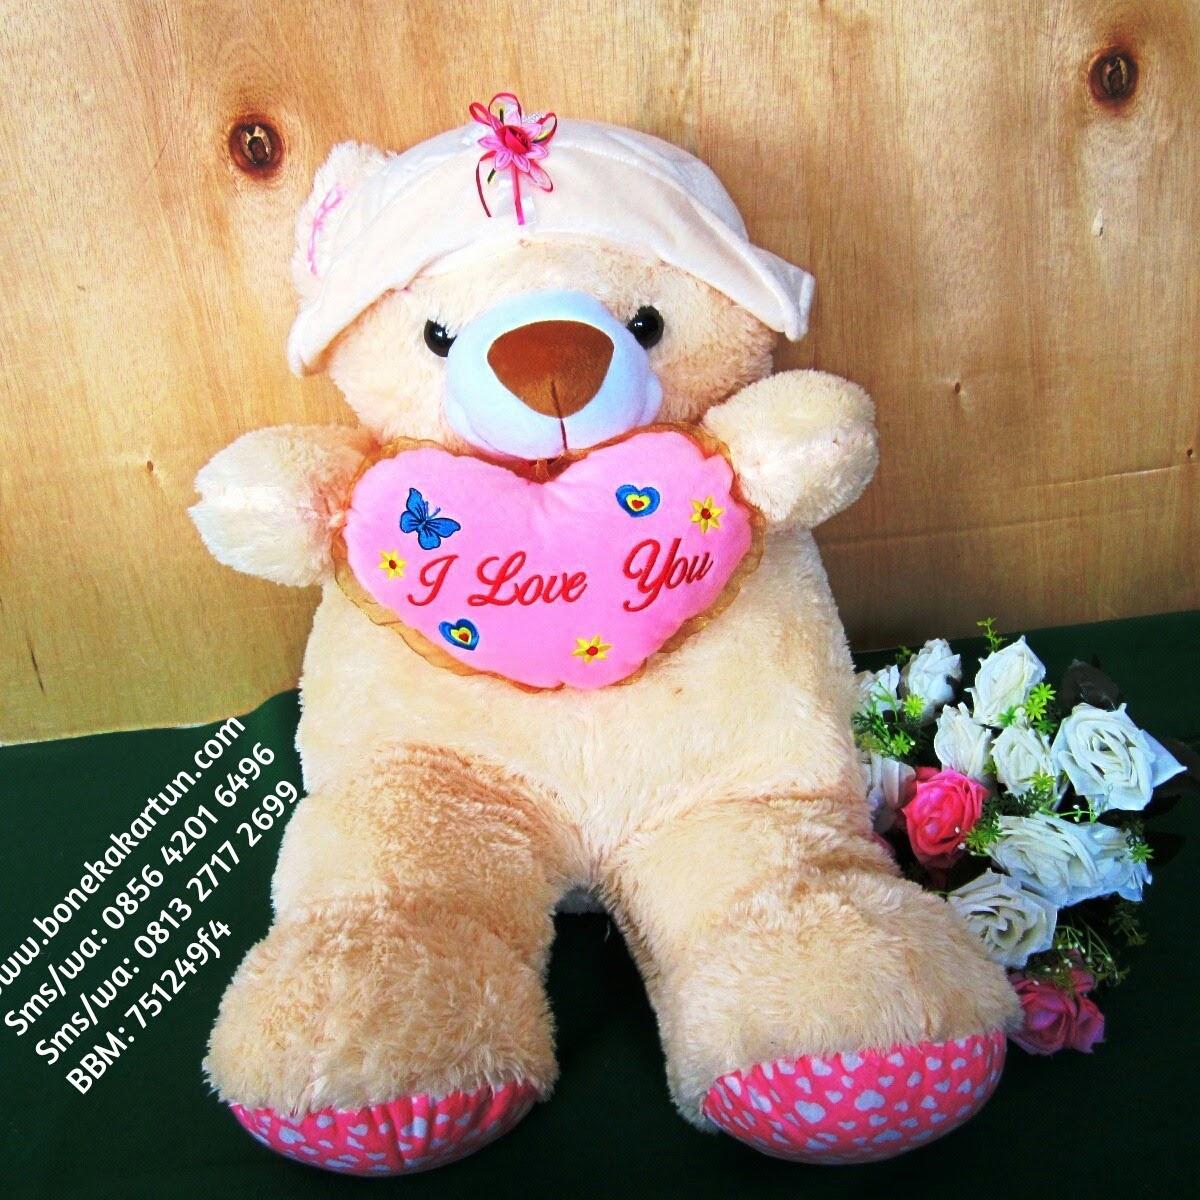 Produk Boneka Lucu Teddy Bear Jumbo Murah Jual Harga Grosir Toko 069b9186a8